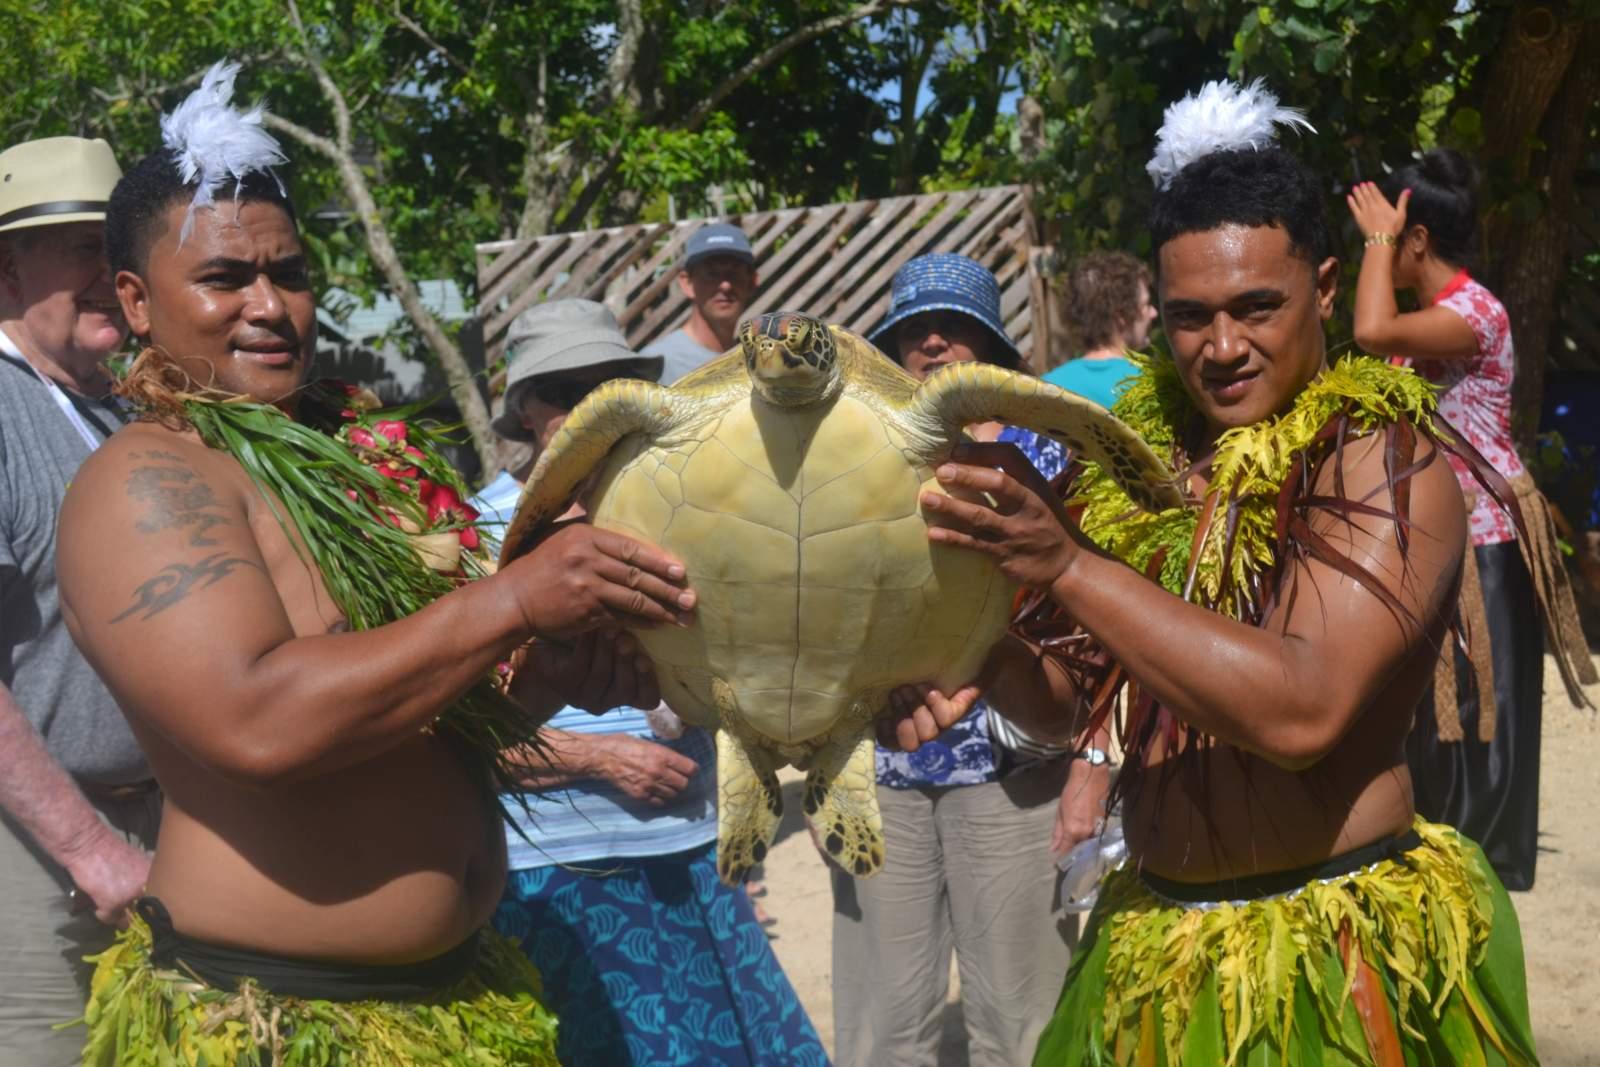 10 Fun Facts About Tonga